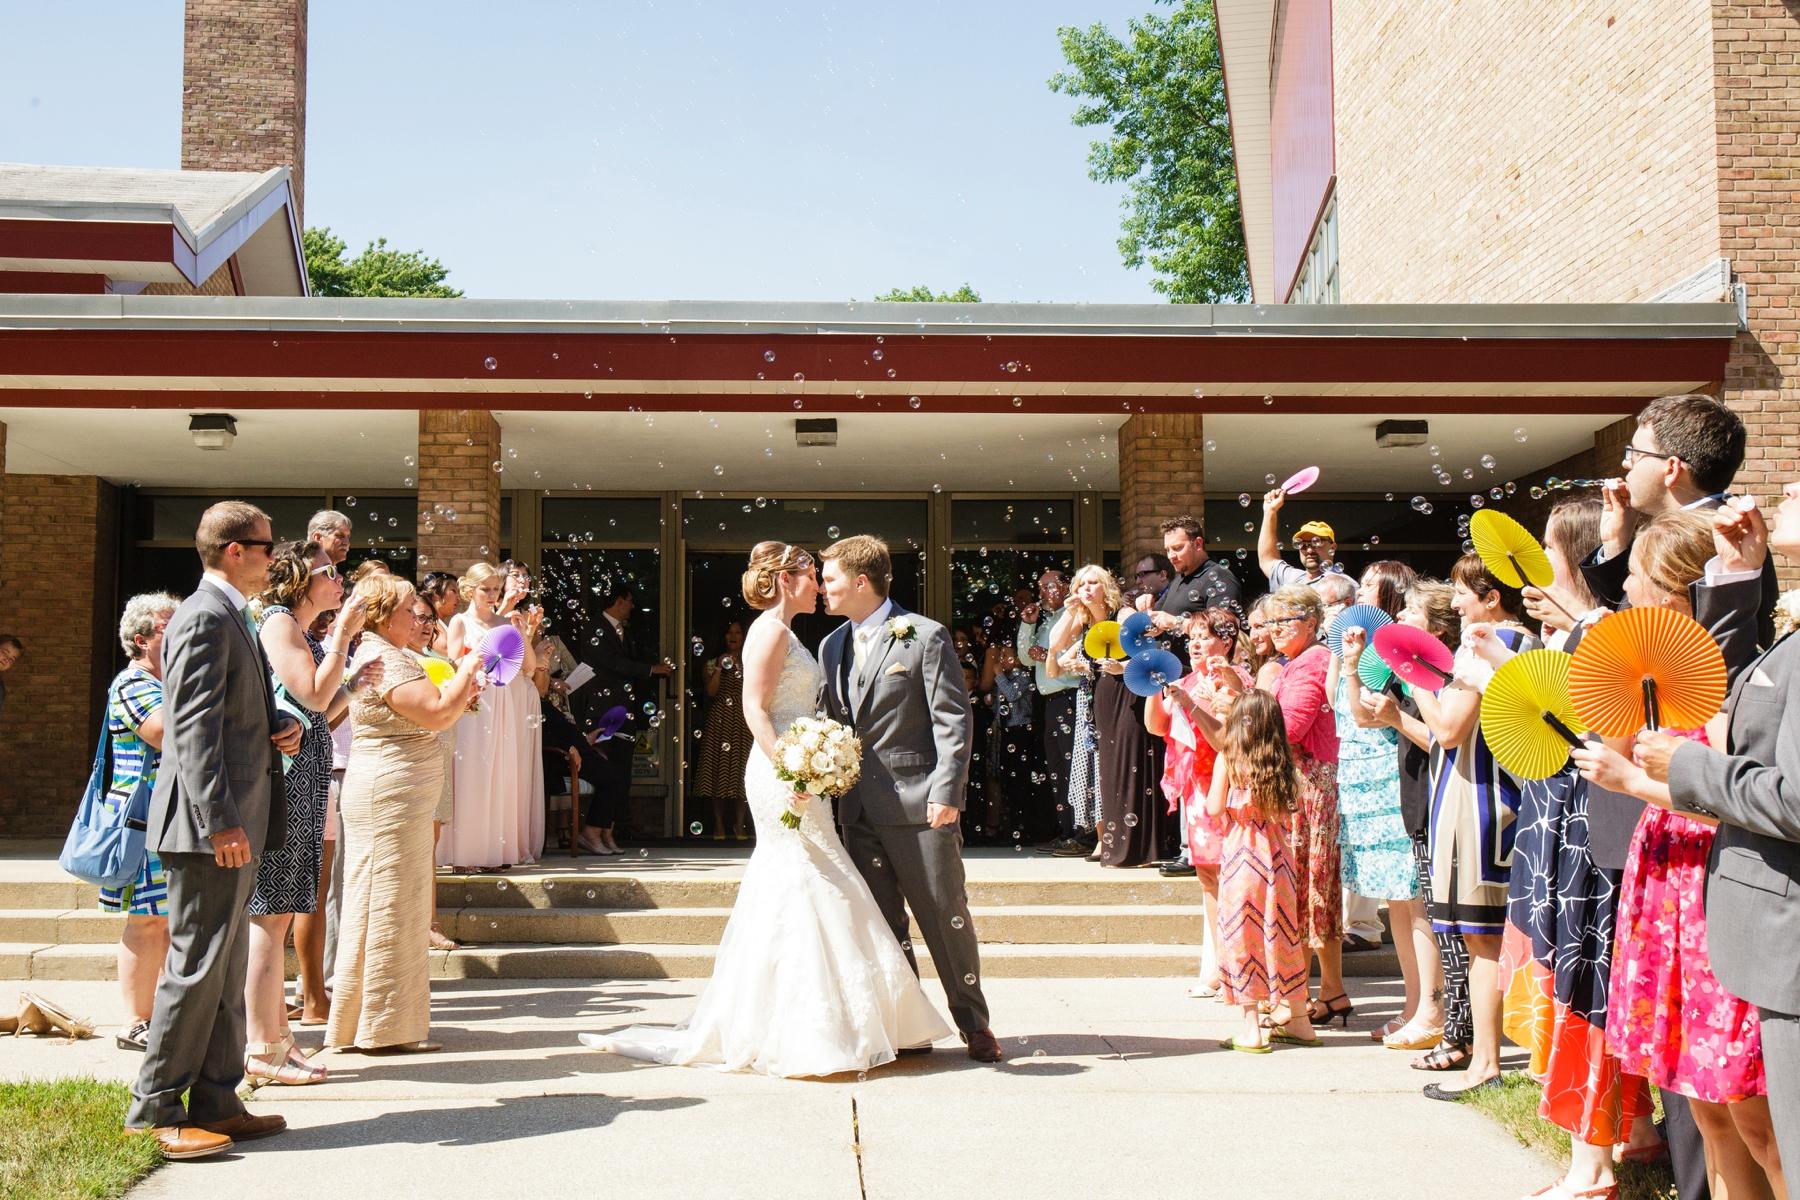 Ben_Jillian_Midland_Baycity_Wedding_0048.jpg